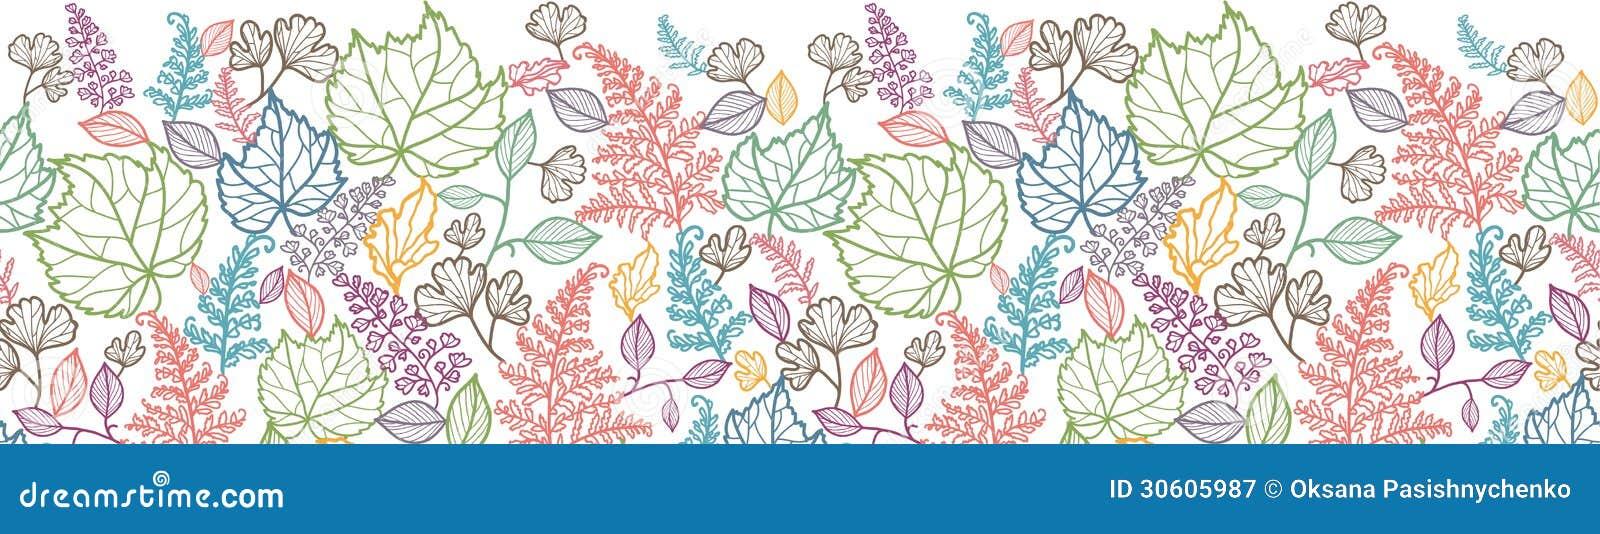 Lijn Art Leaves Horizontal Seamless Pattern